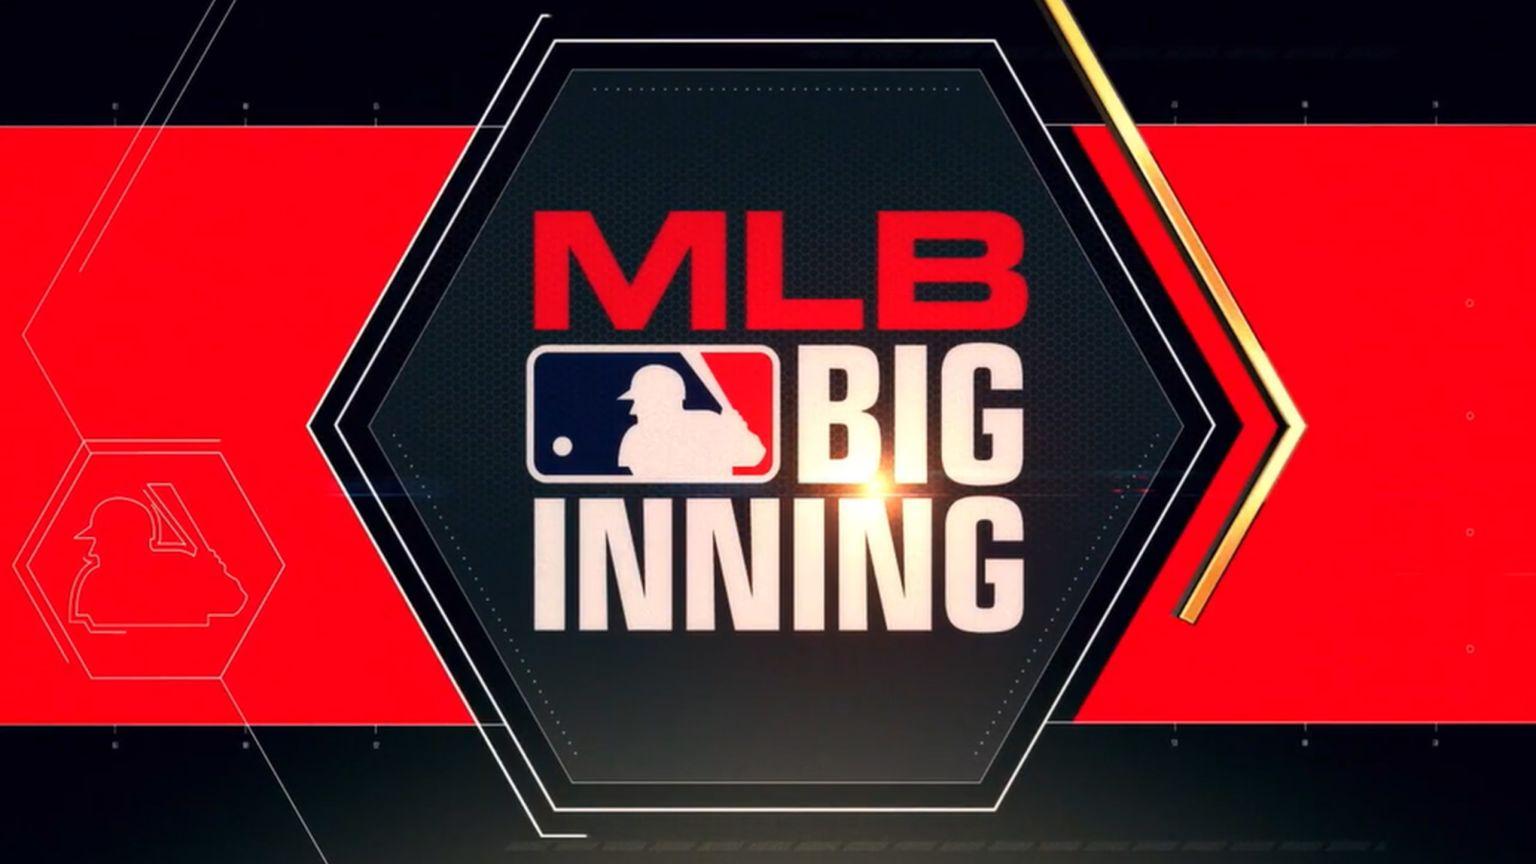 MLB.TV Trade deadline promo $24.99